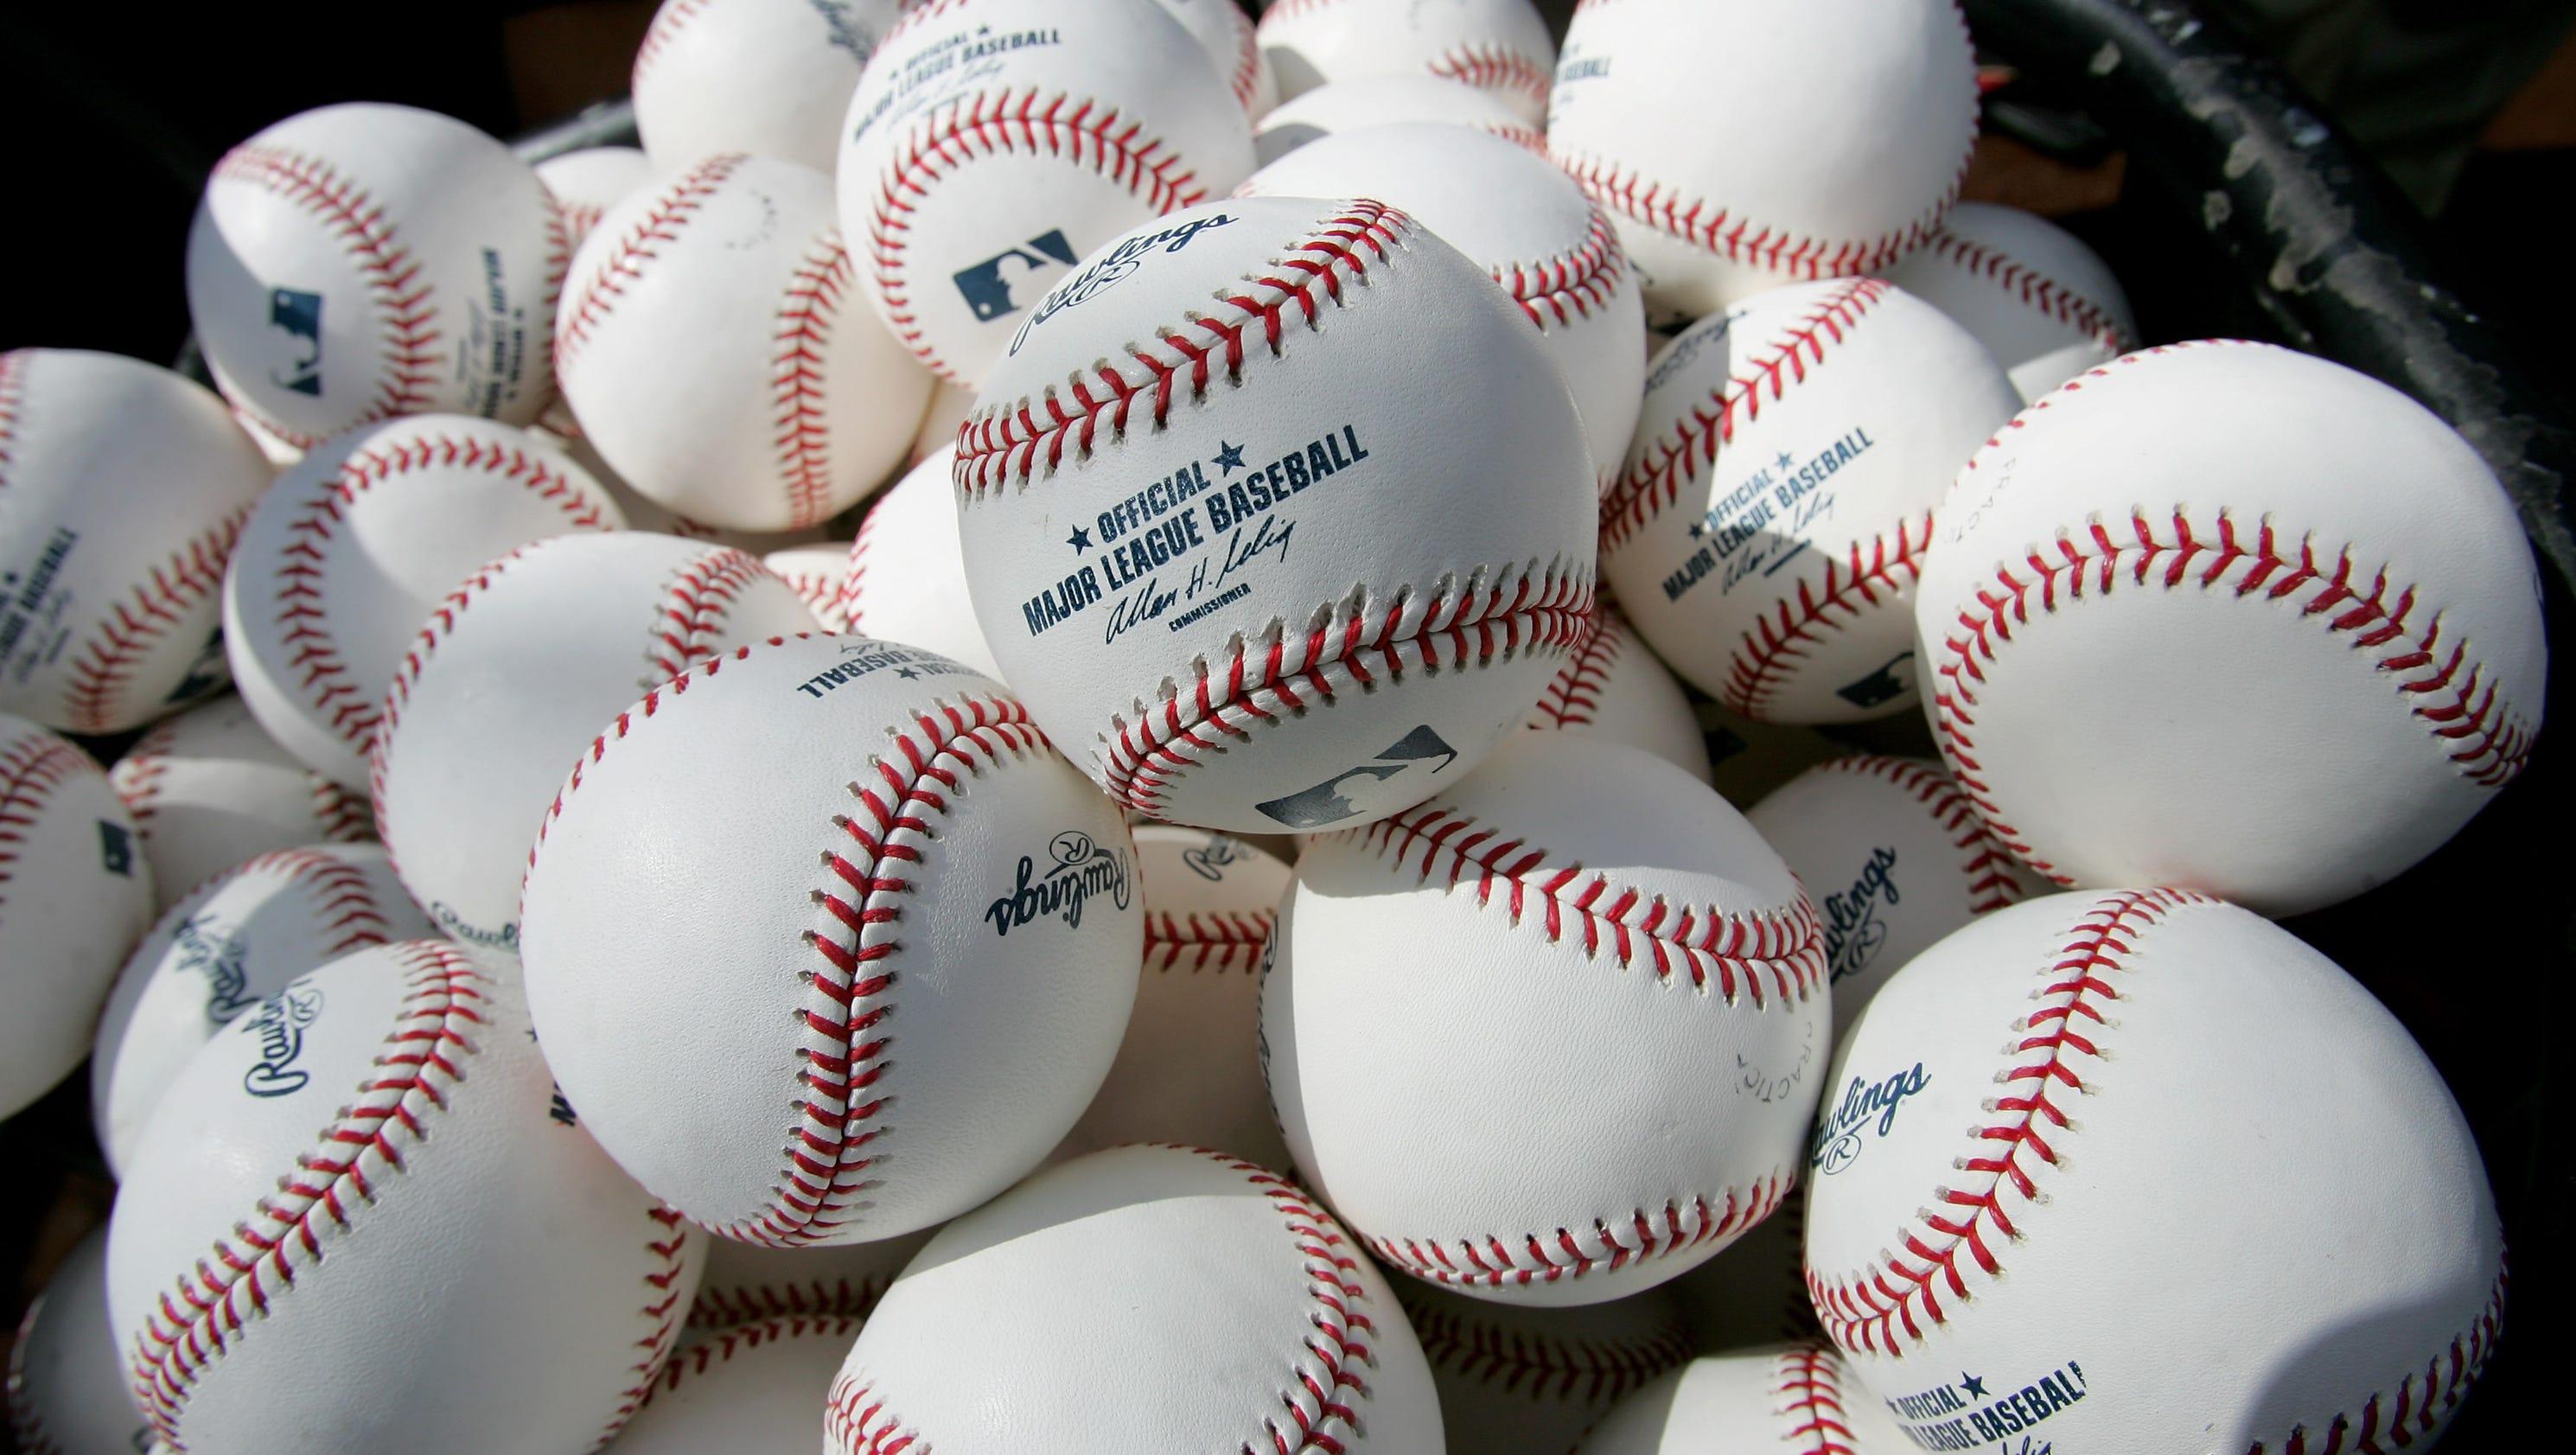 635882105379424083-baseballs